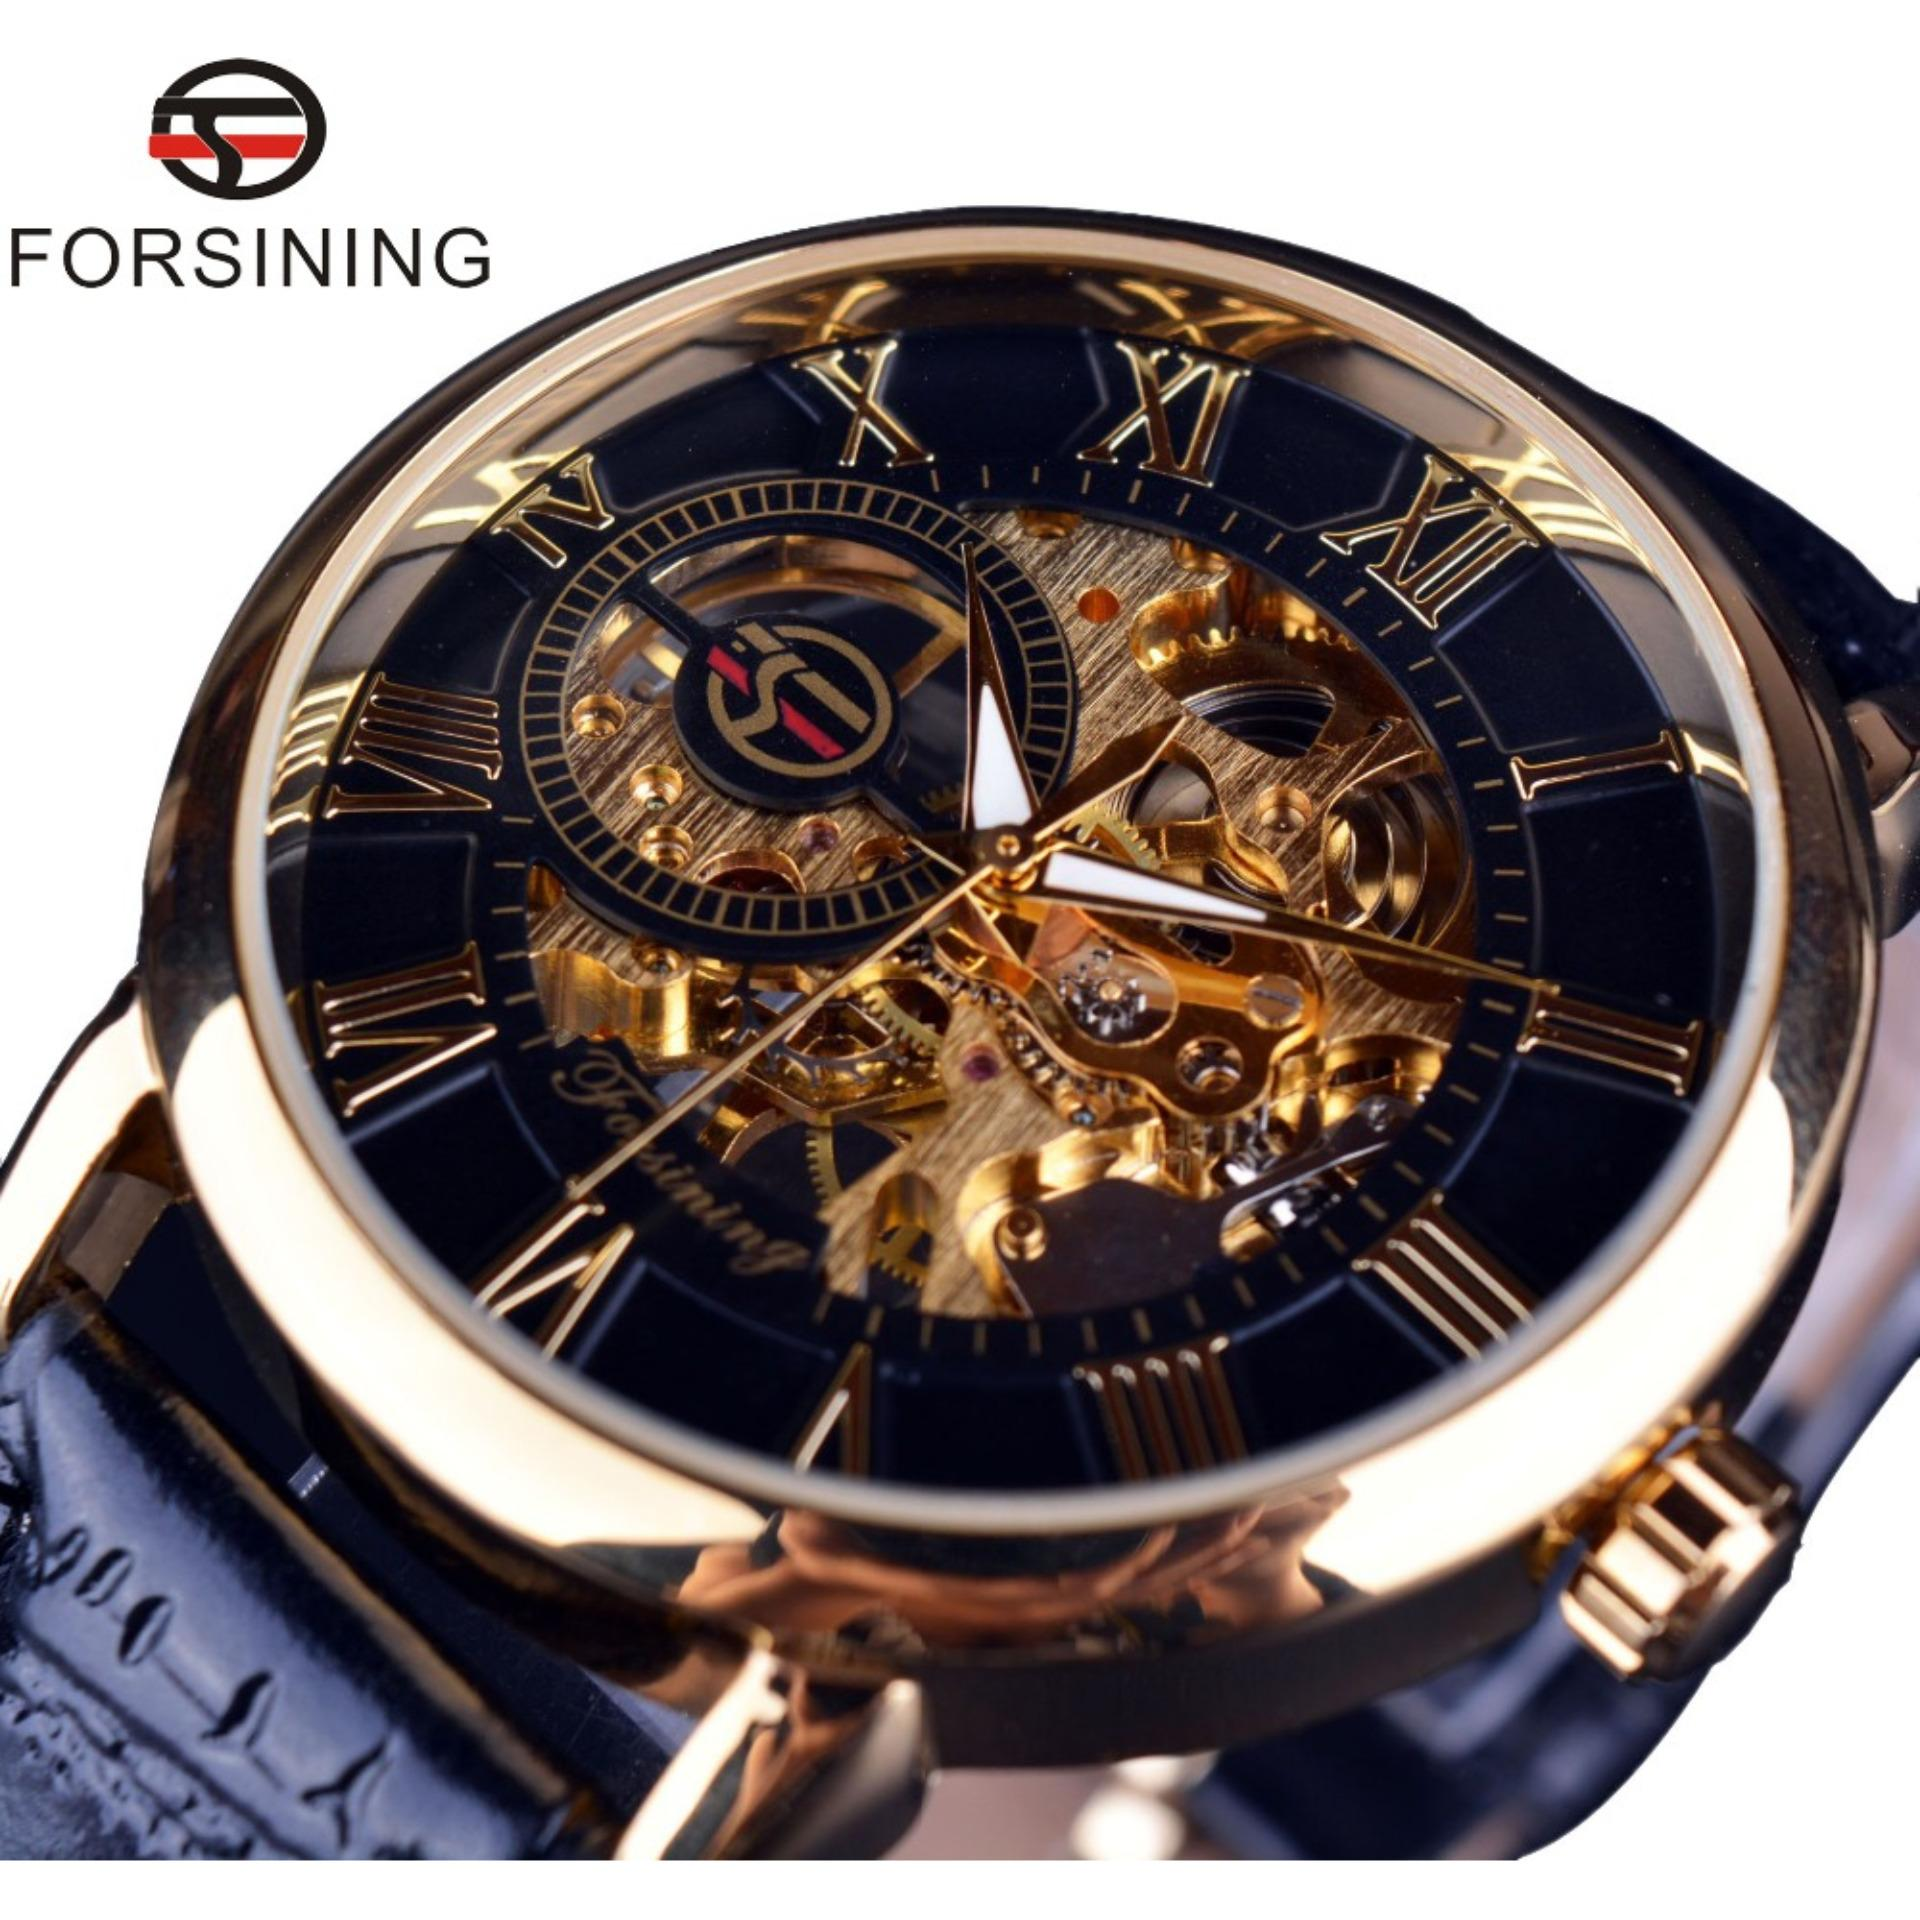 Forsining Asli Hollow Men's Mechanical Watch Pria Watch Black-Intl